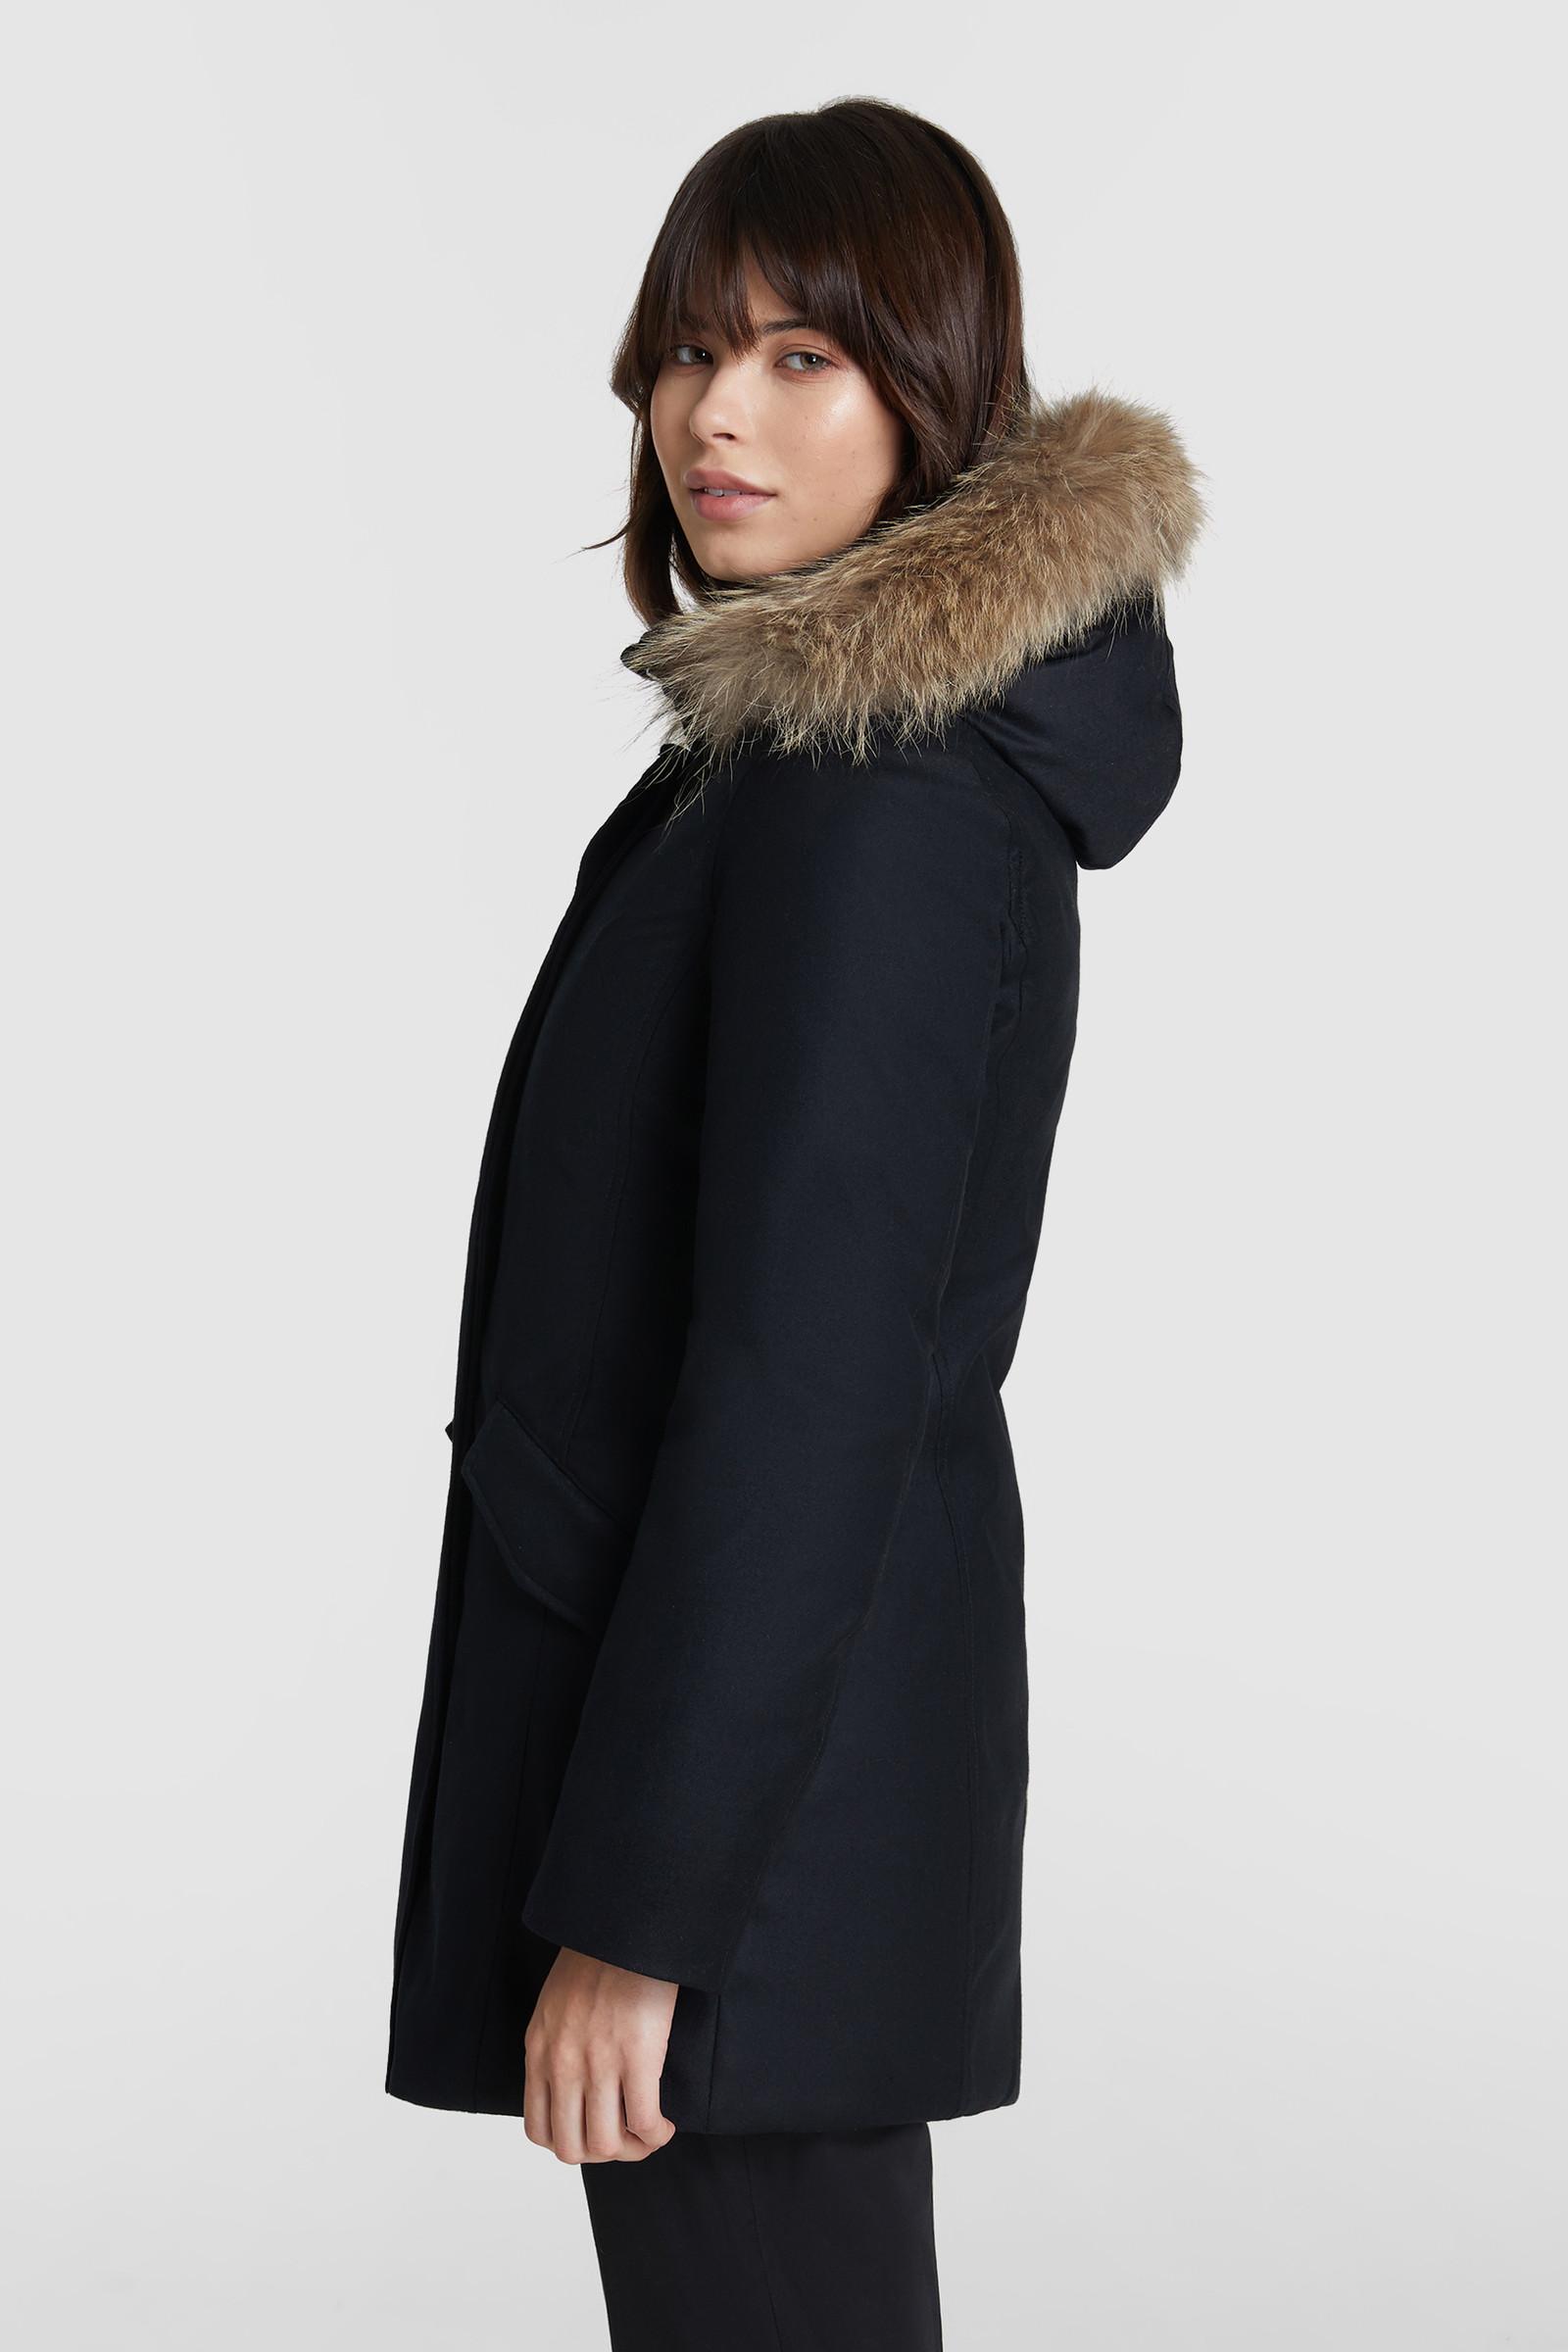 Arctic Parka luxe in lana pregiata, pelliccia coyote